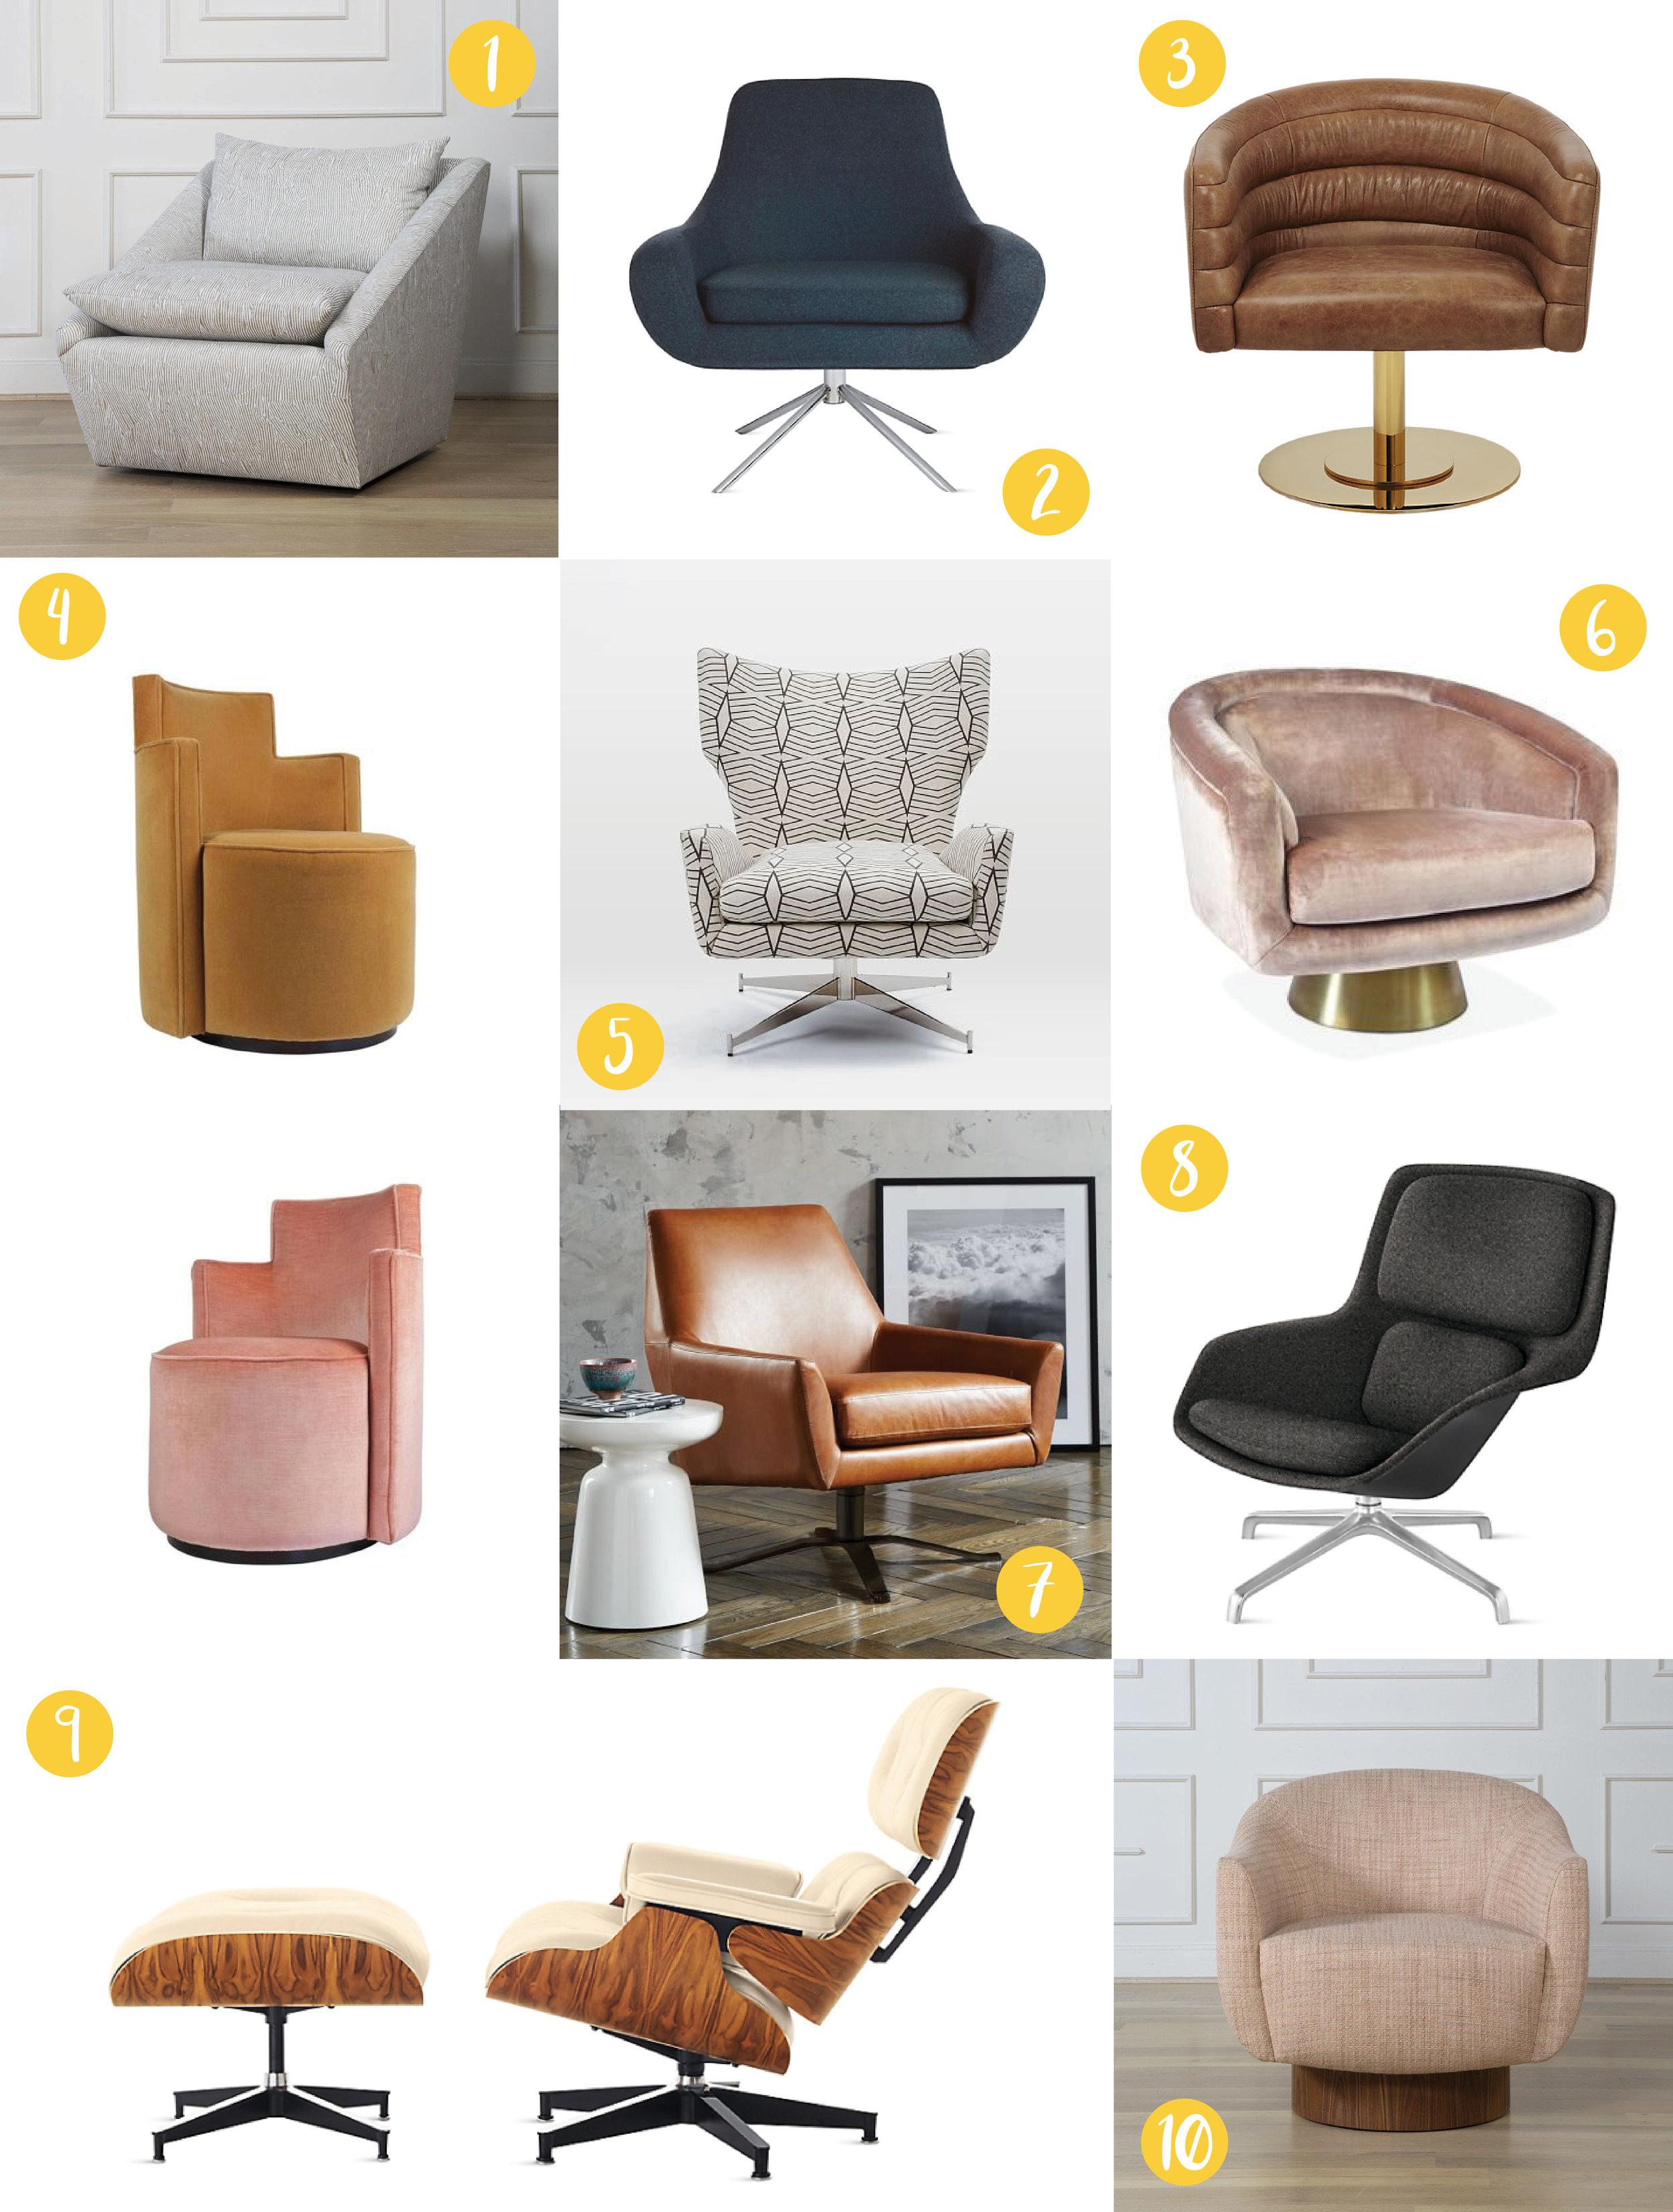 swivel chair west elm allsteel access nyla free designs inc top 10 chairs andree putman armchairs 1st dibs 5 hemming armchair 6 bacharach jonathan adler 7 lucas